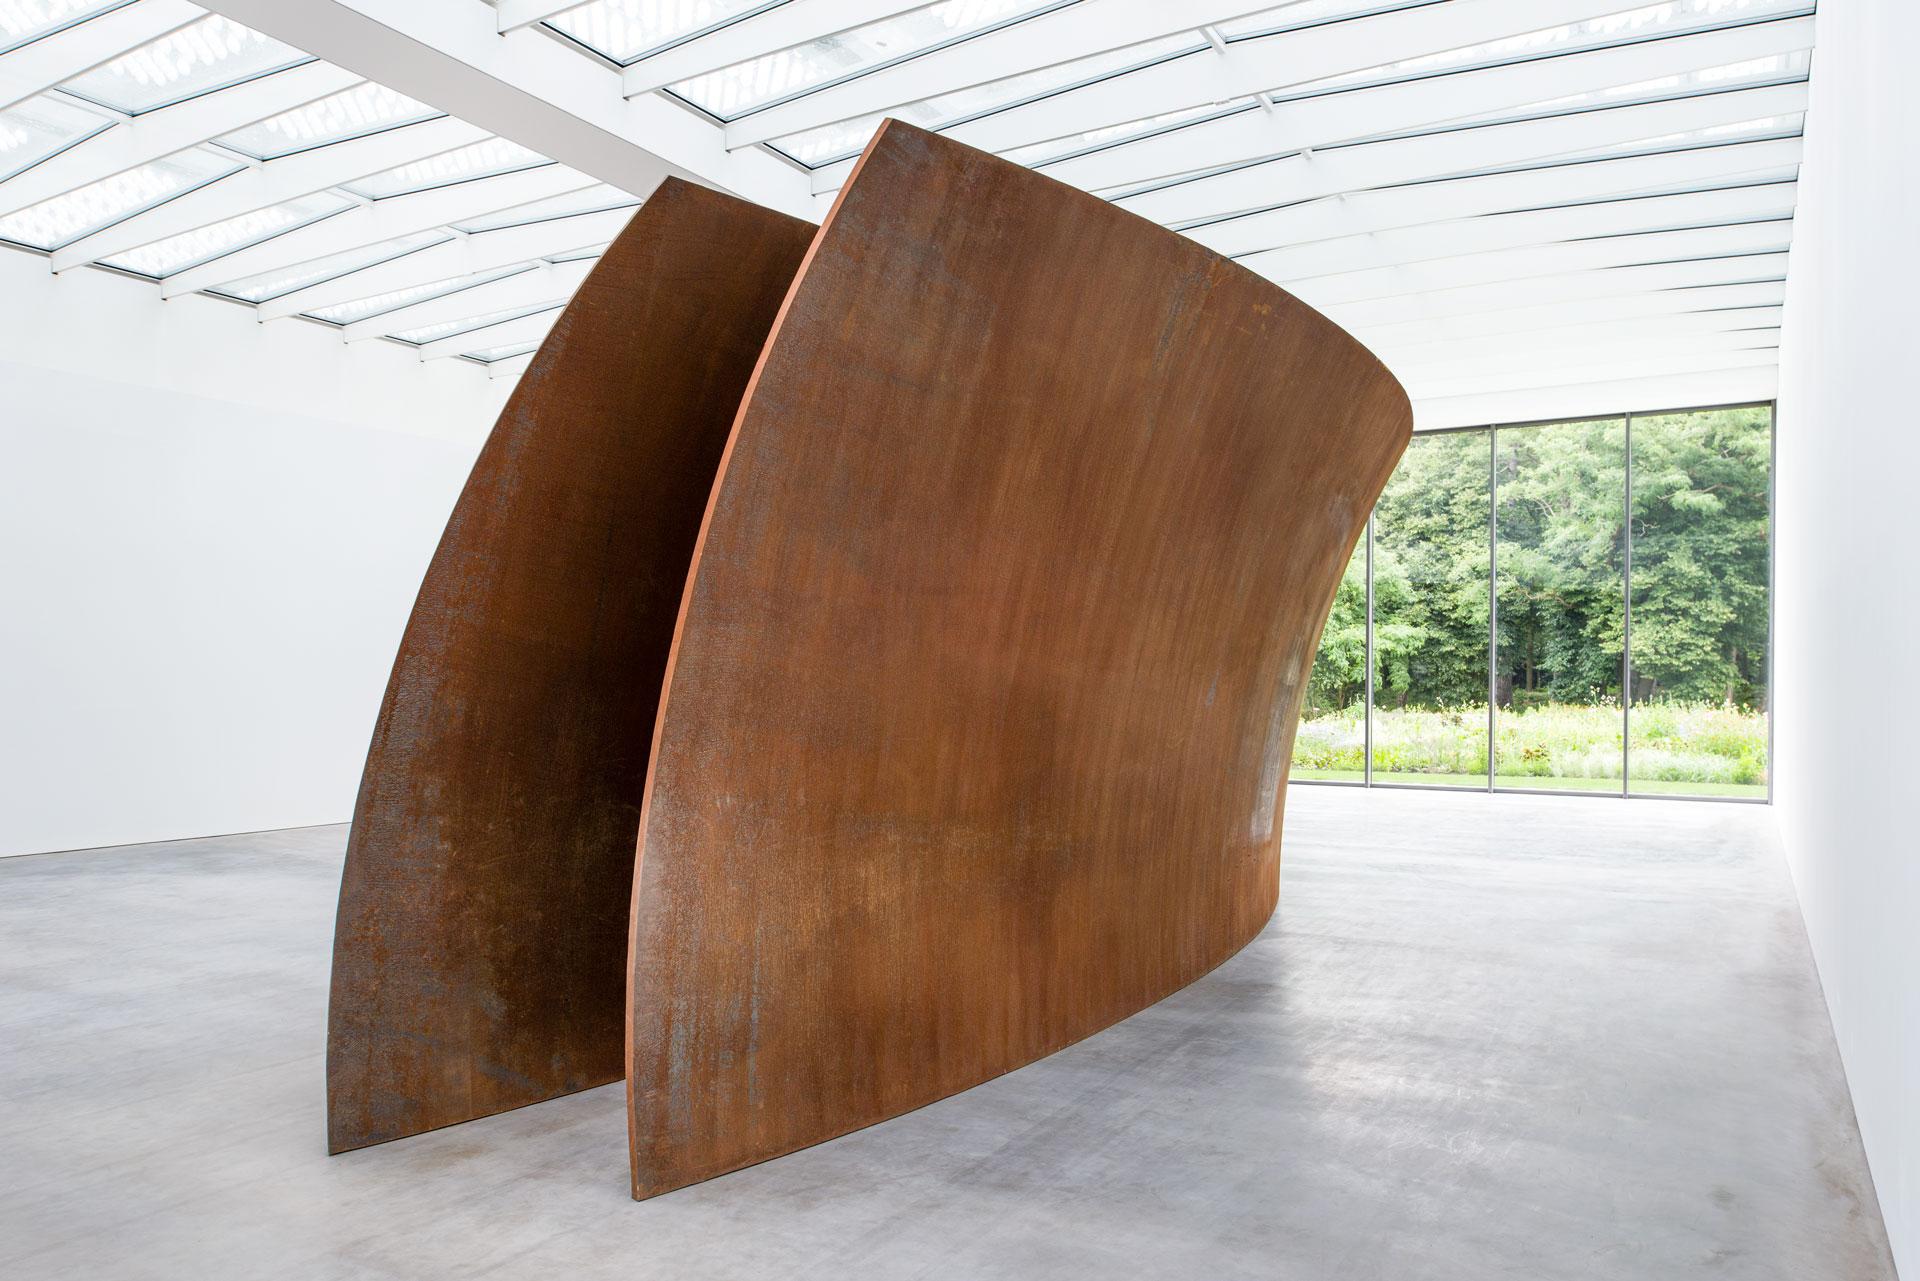 MuseumVoorlinden-RichardSerra-OpenEnded-AntoineVanKaam-1920